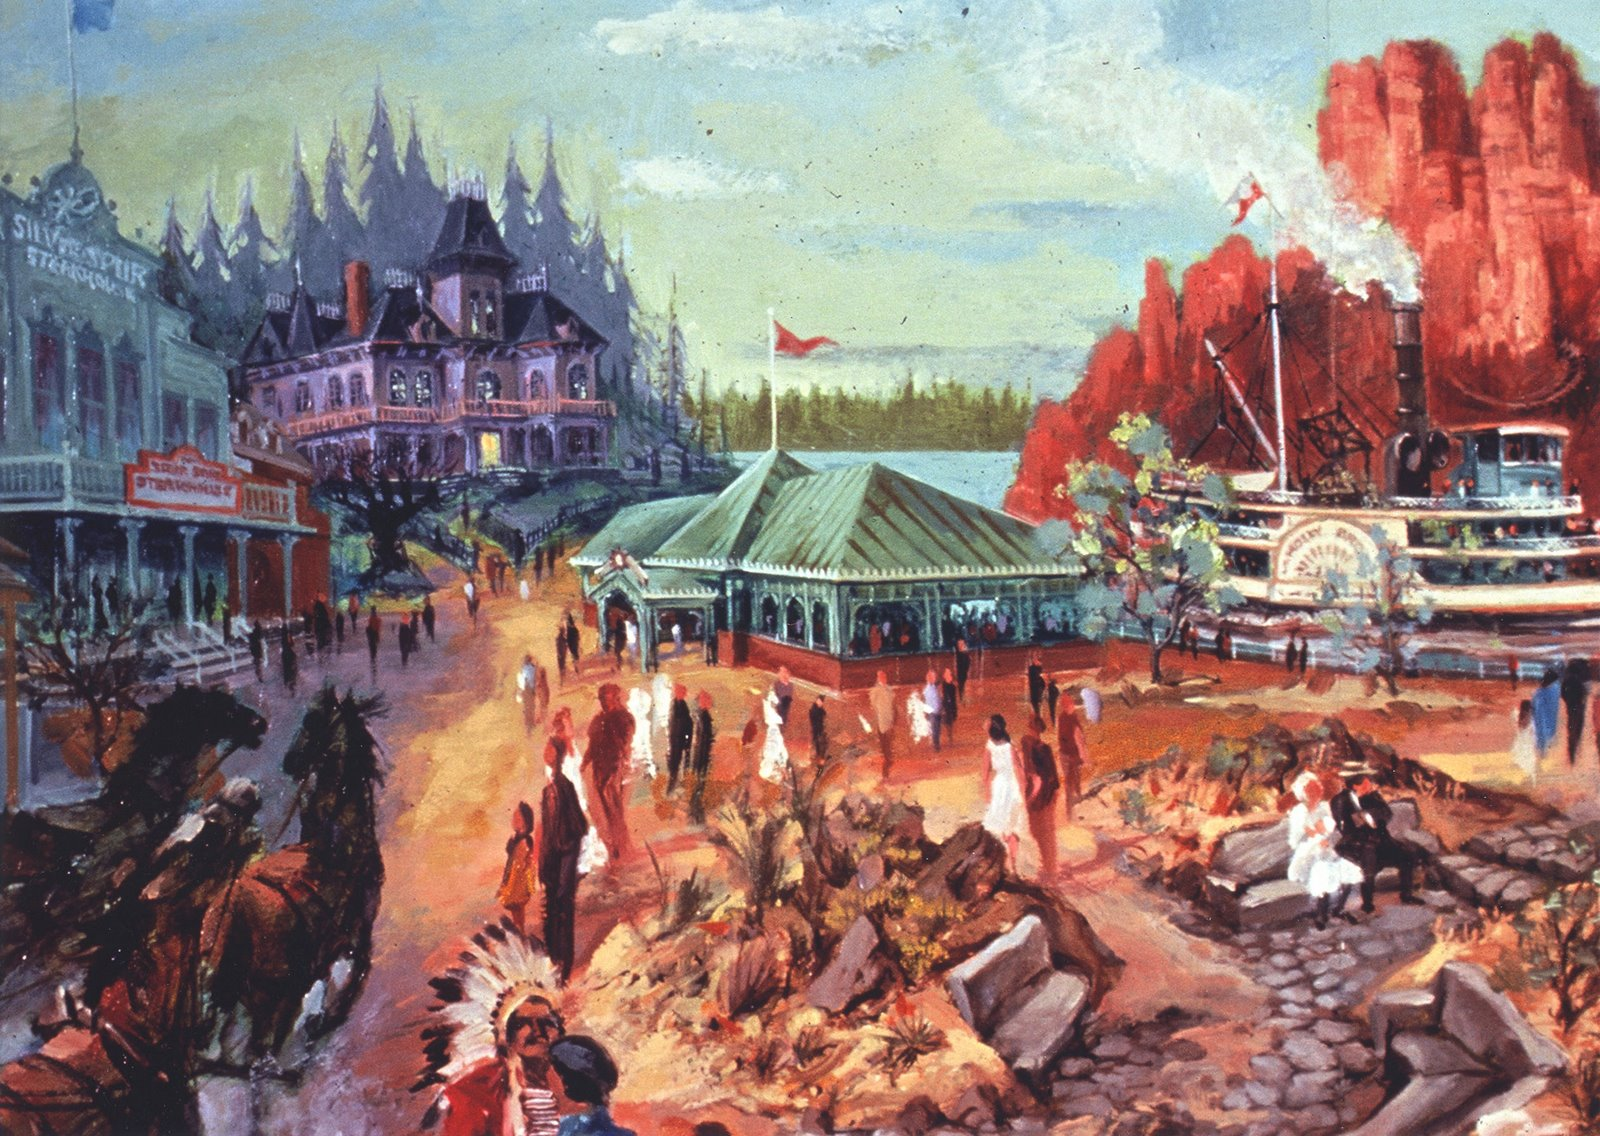 Thunder Mesa à Frontierland, Disneyland Paris, par Dan Goozeé